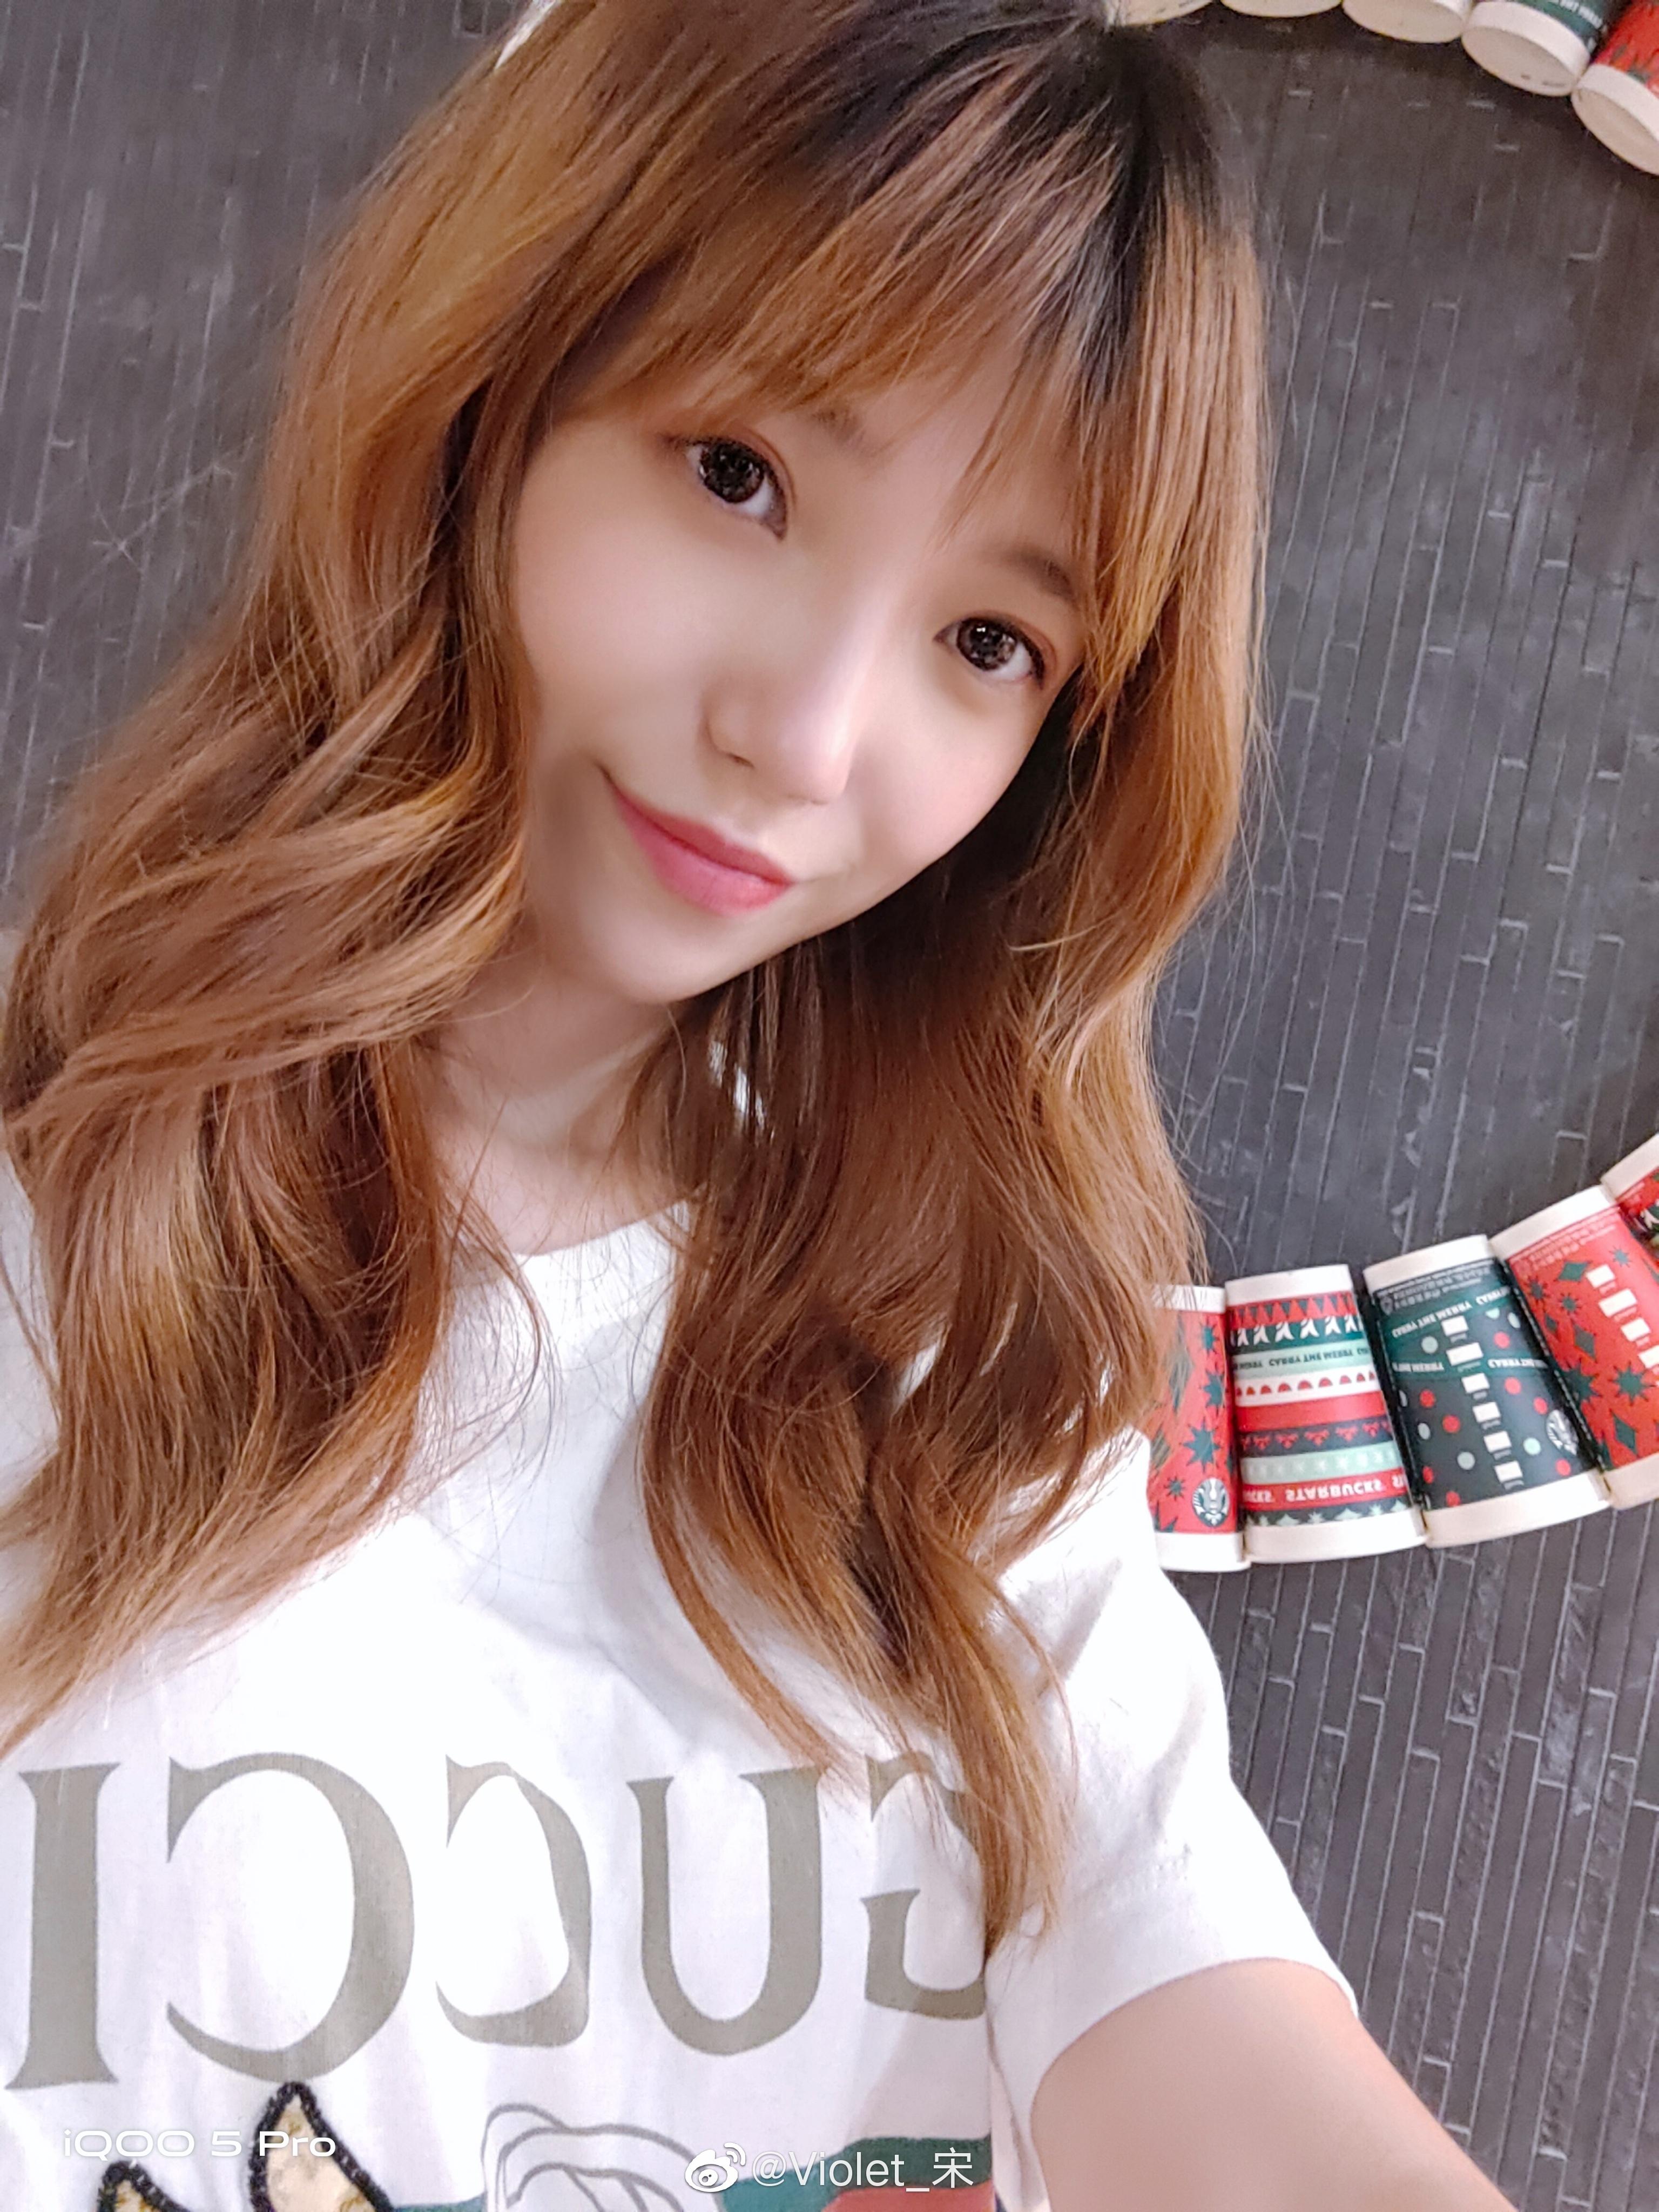 宋紫薇_202101121557_001